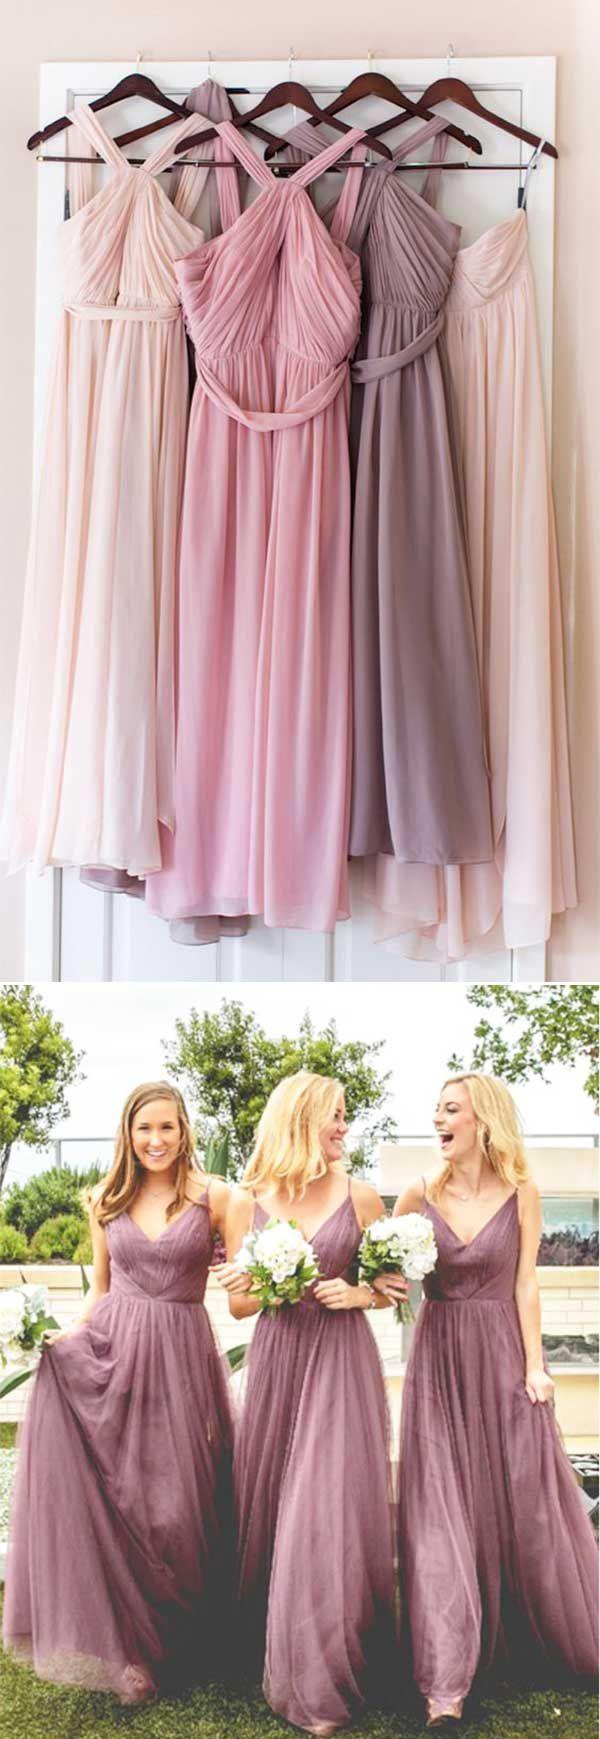 2018 Stylish Prettiest Wedding Color Trend Shade Of Mauve Wedding Invites Paper Dust Mauve Bridesmaid Dress Bridesmaid Dress Pink Shades Mauve Bridesmaid